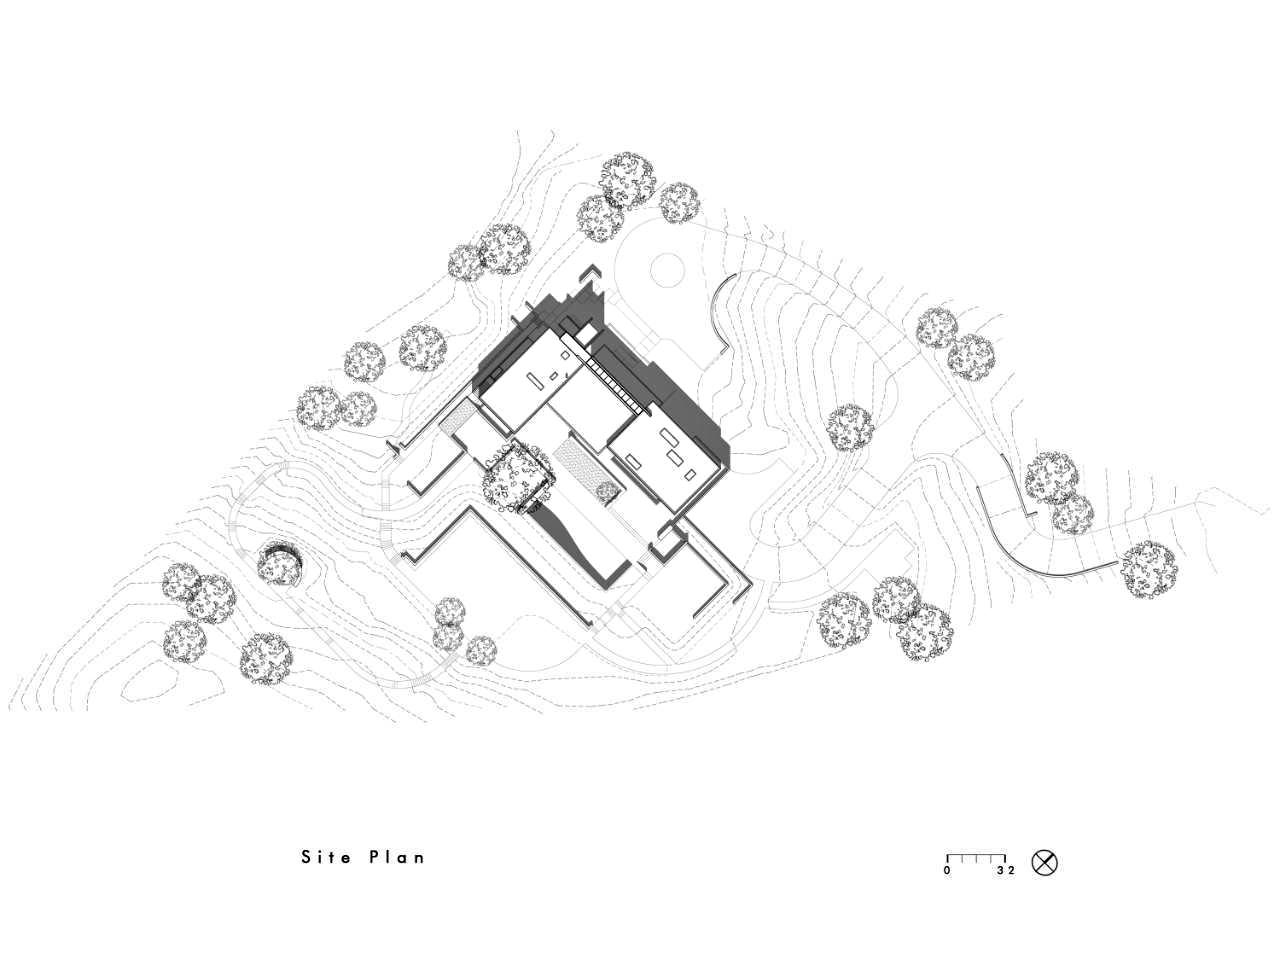 Site Plan – Modern Luxury OZ Residence – 92 Sutherland Drive, Atherton, CA, USA